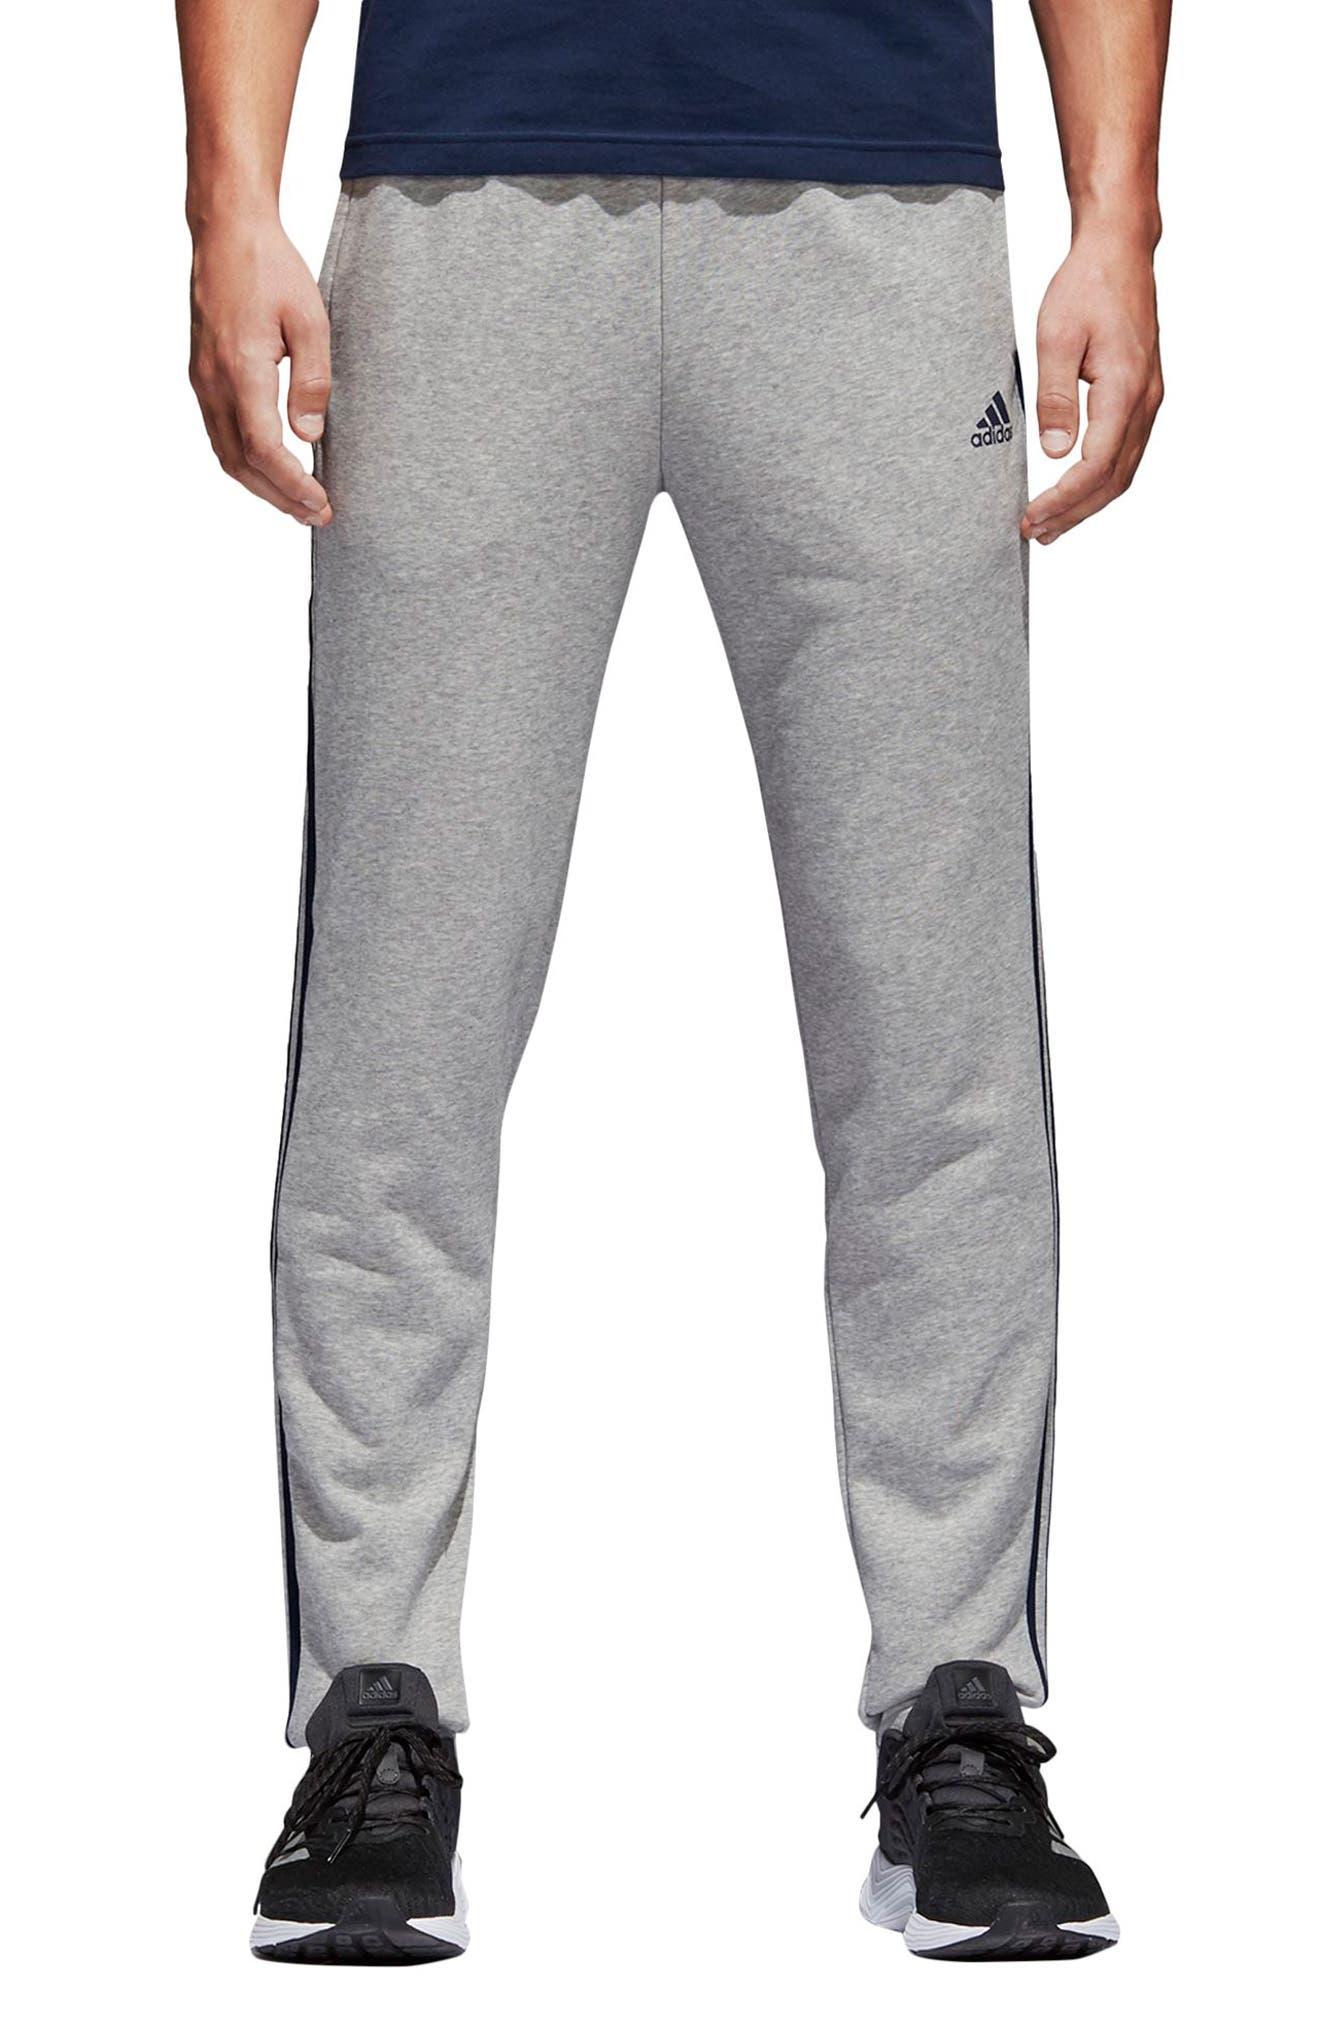 Adidas Essentials 3-Stripes Straight Leg Sweatpants